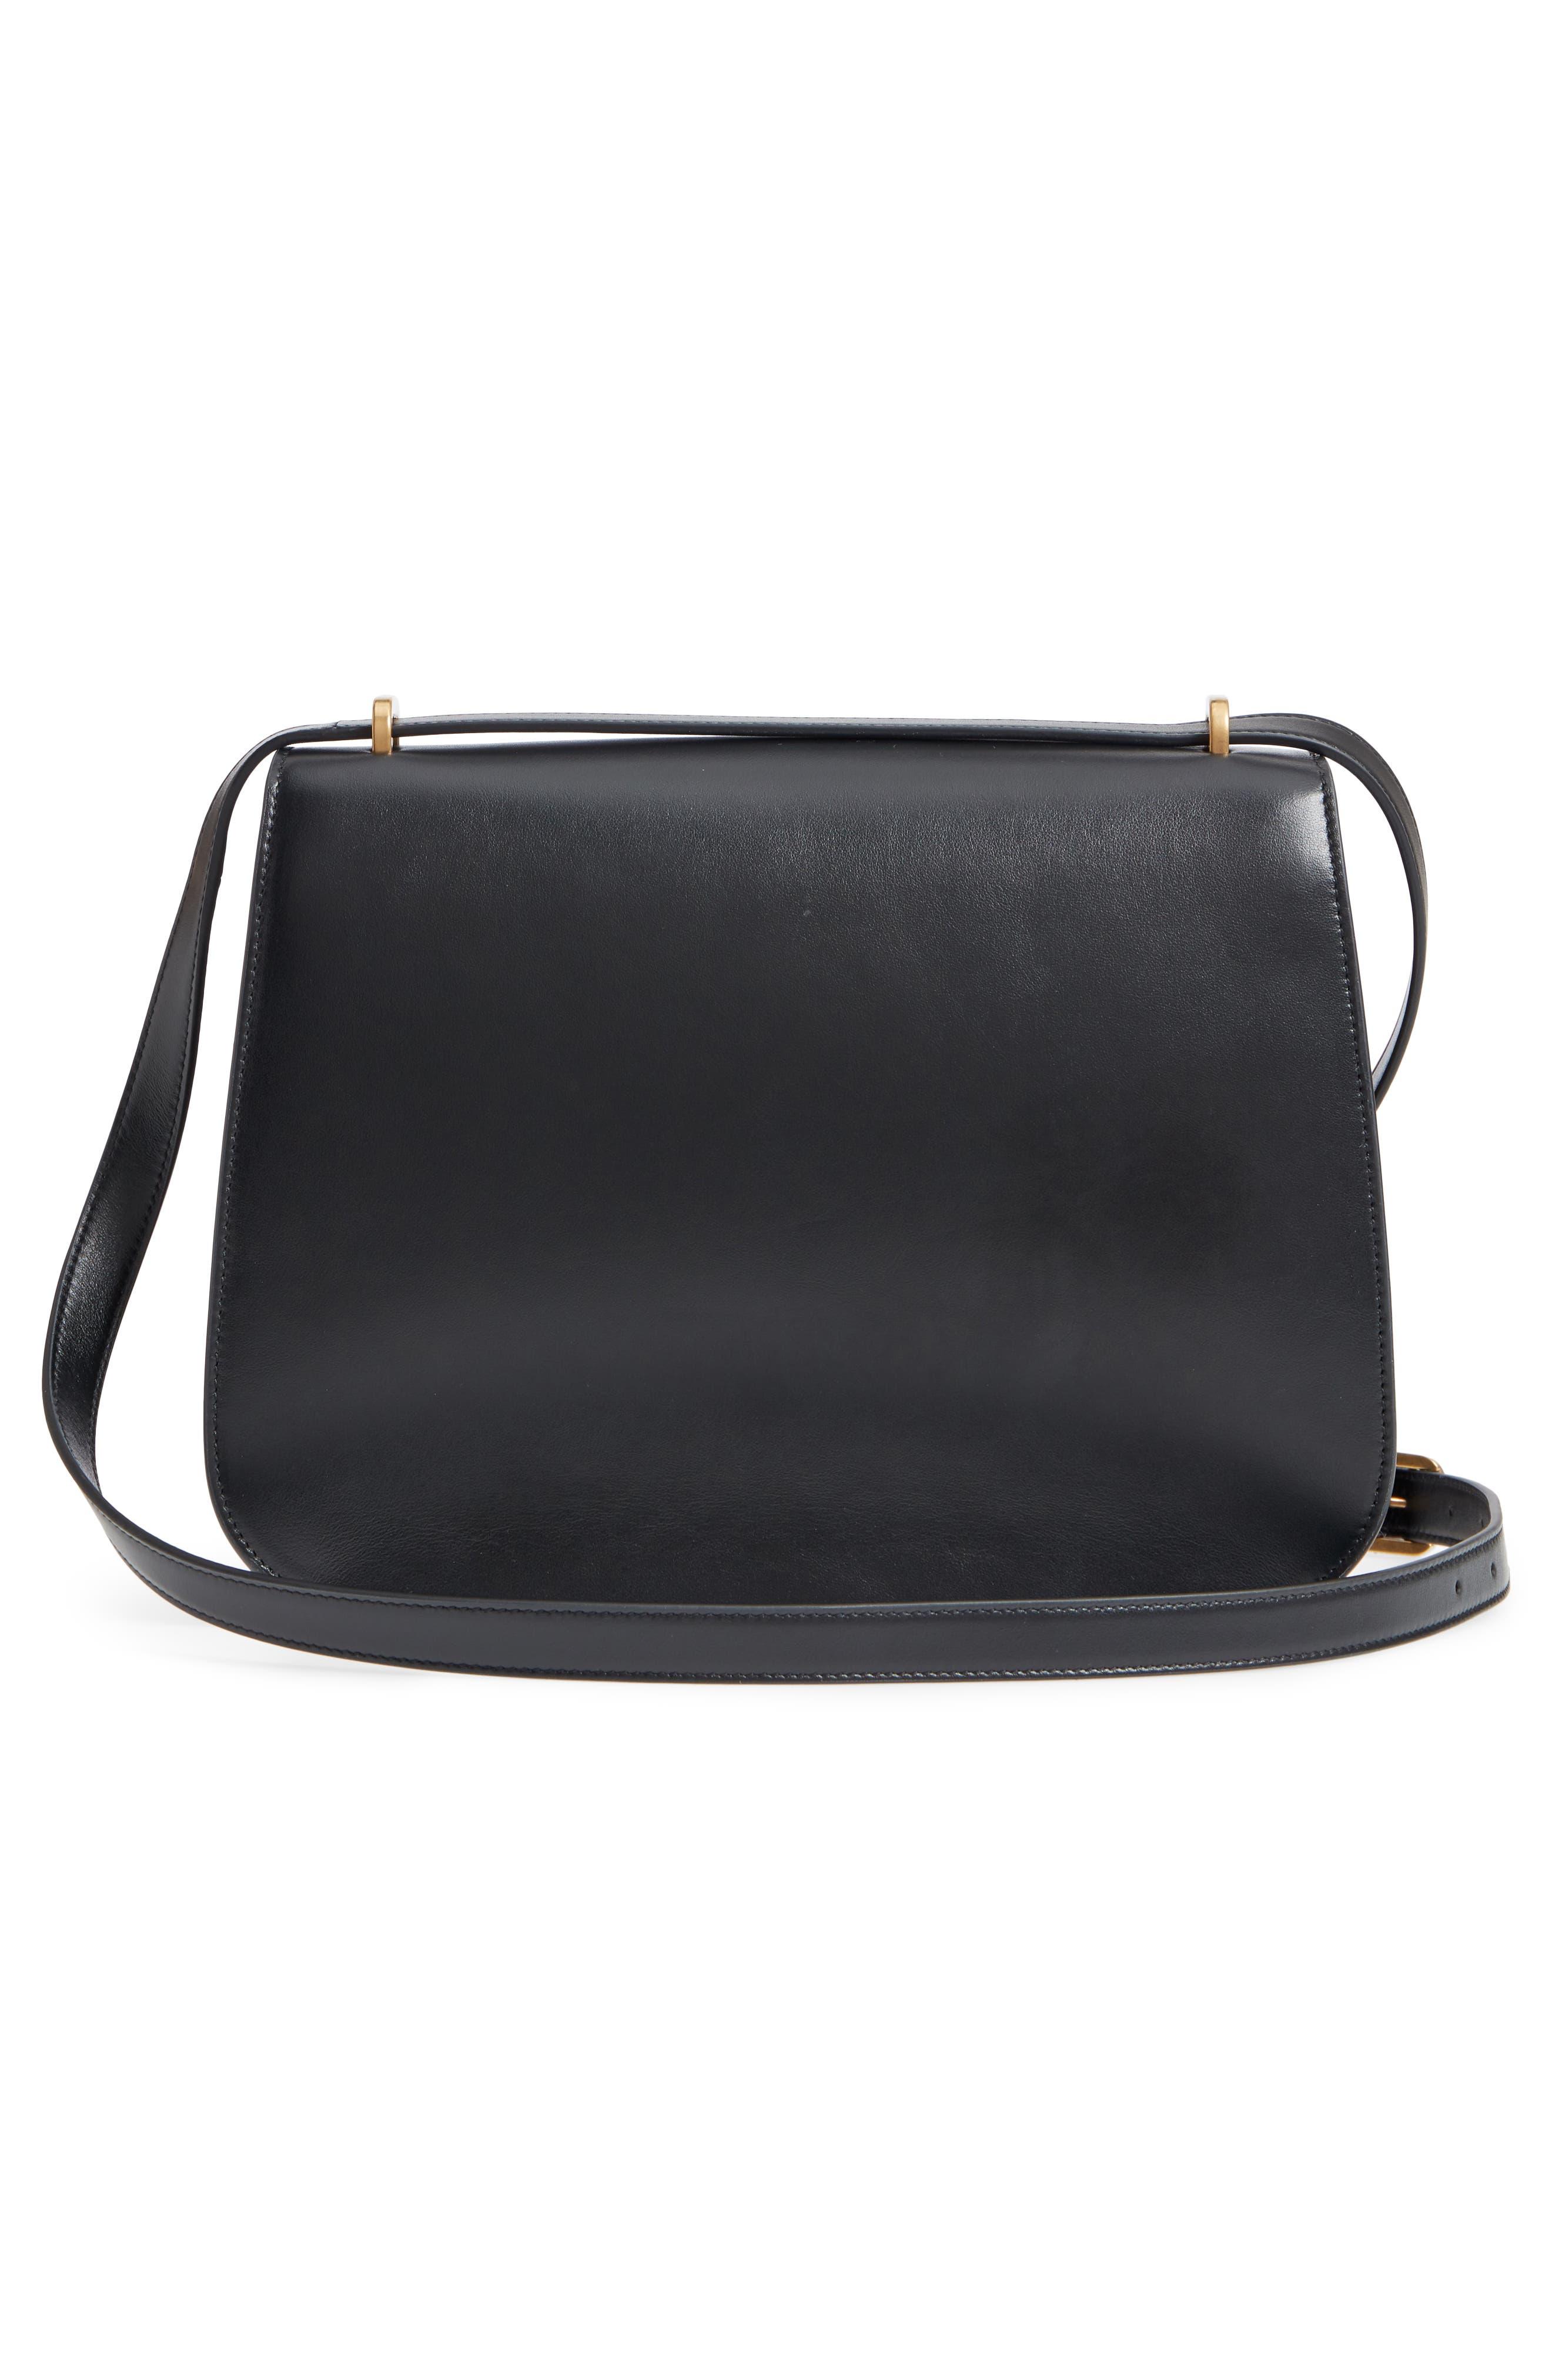 Medium Spontini Leather Shoulder Bag,                             Alternate thumbnail 3, color,                             NERO